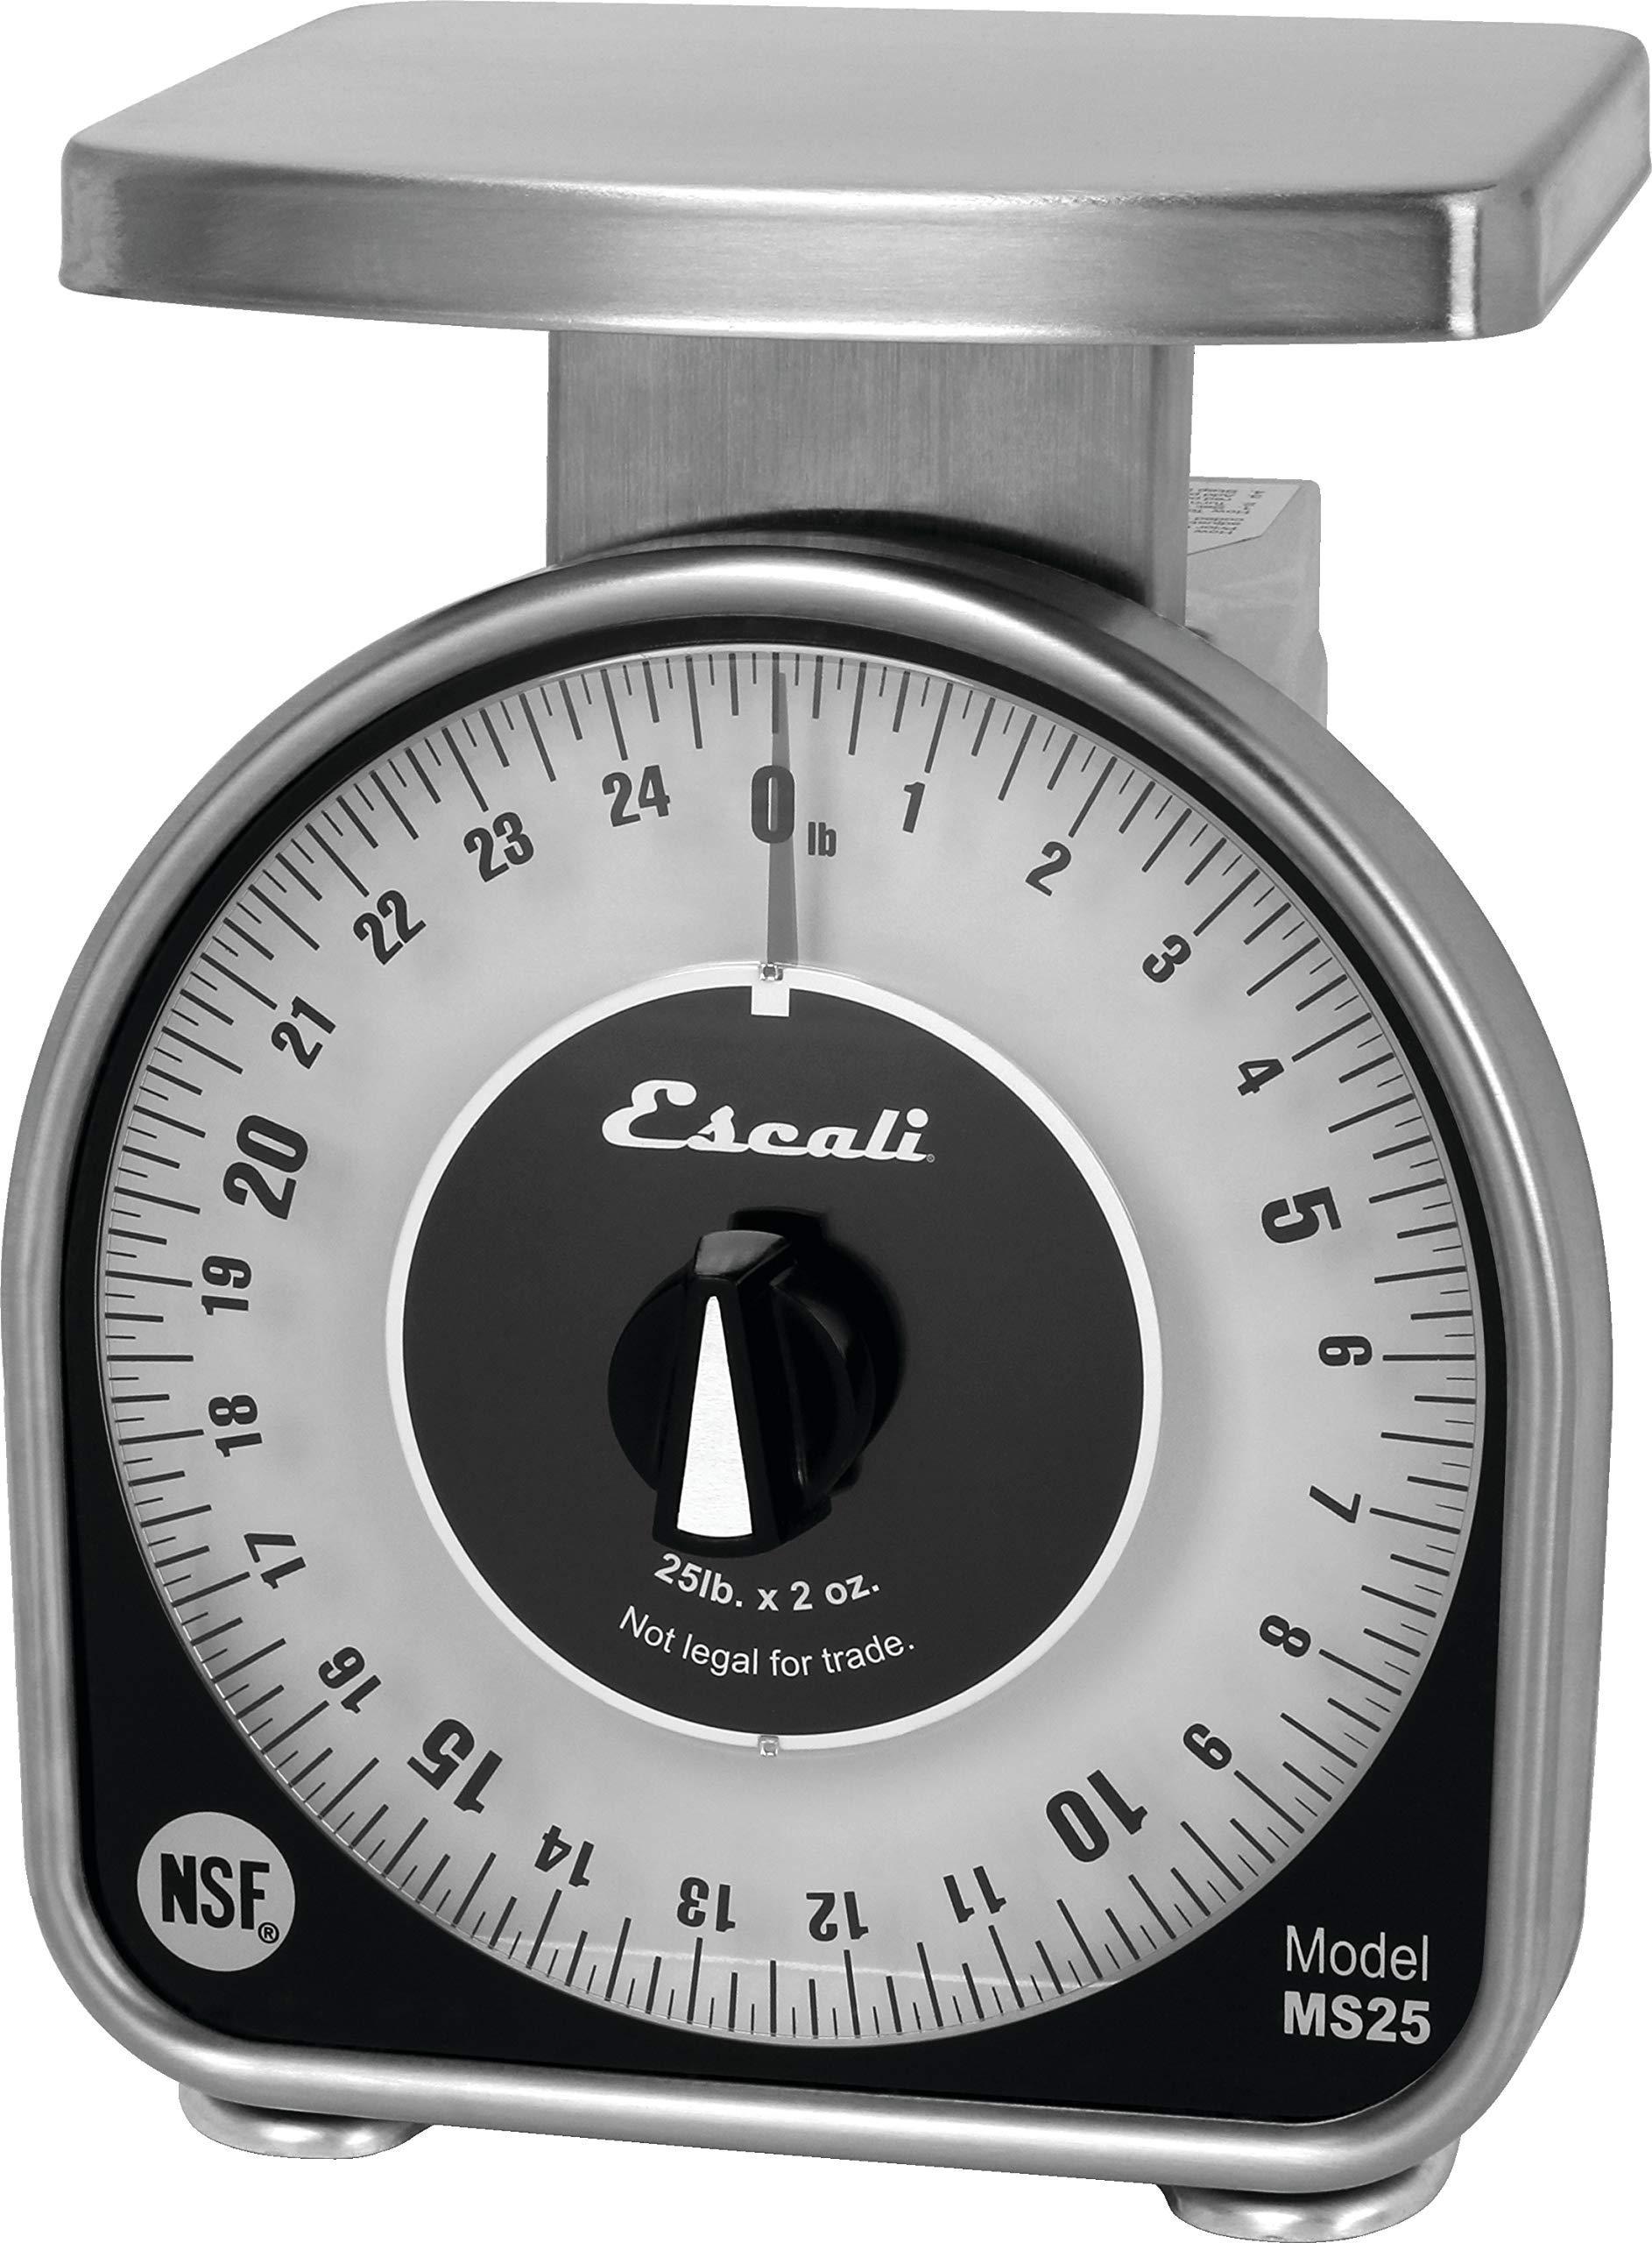 San Jamar SCMDL25 Mechnical Dial Food/Kitchen Scale, 25 lb Capacity by San Jamar